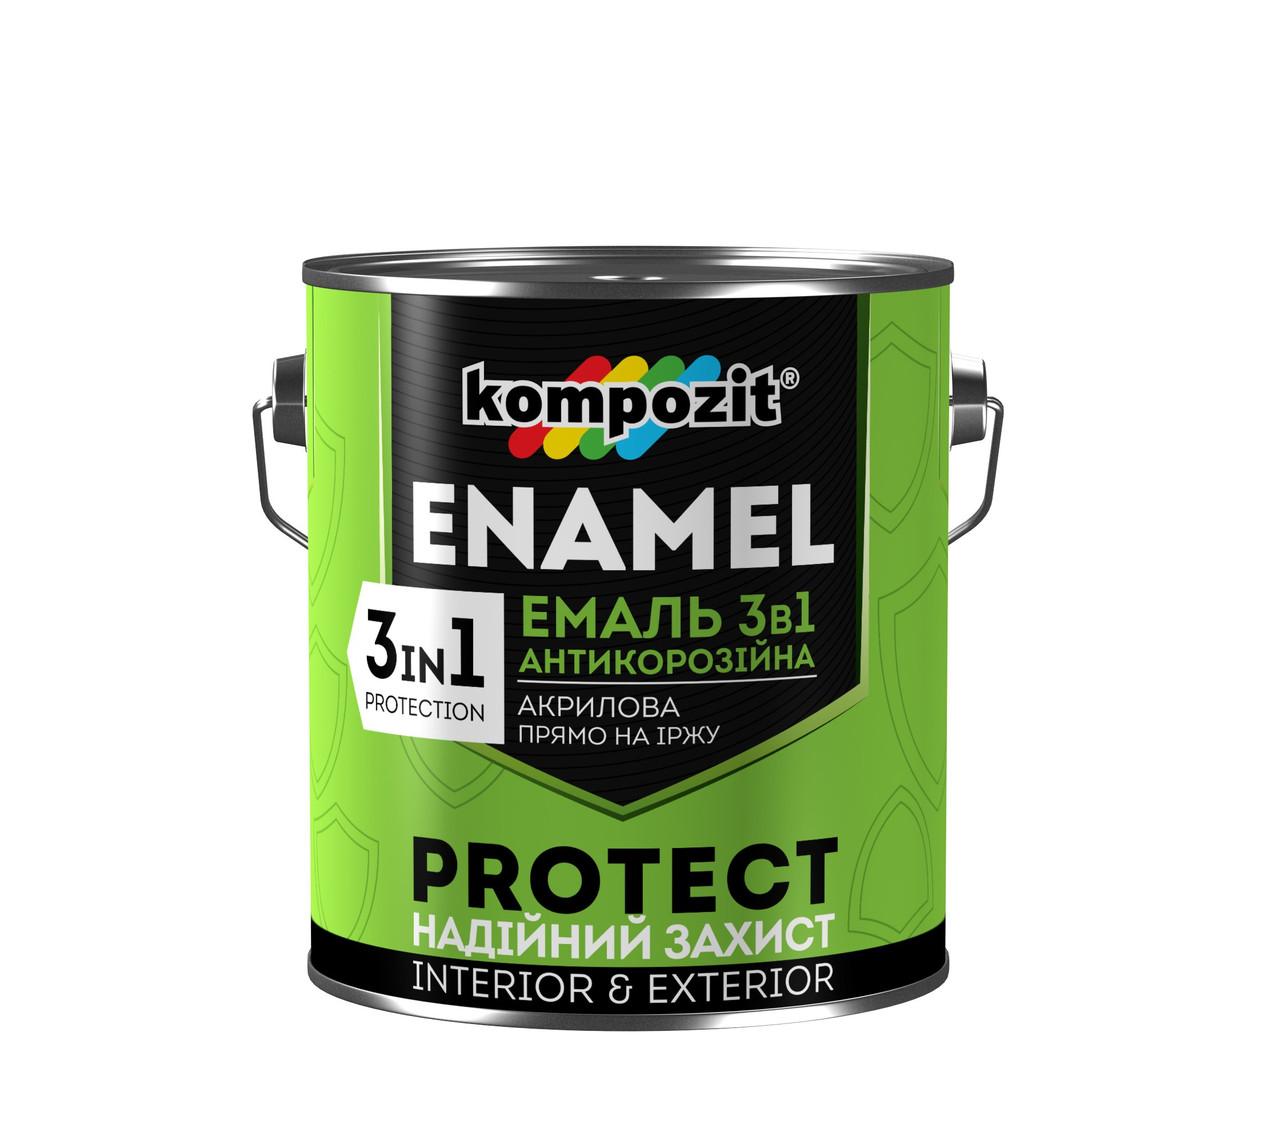 Емаль 3 в 1 антикорозійна Protect КОМПОЗИТ коричнева 10 кг